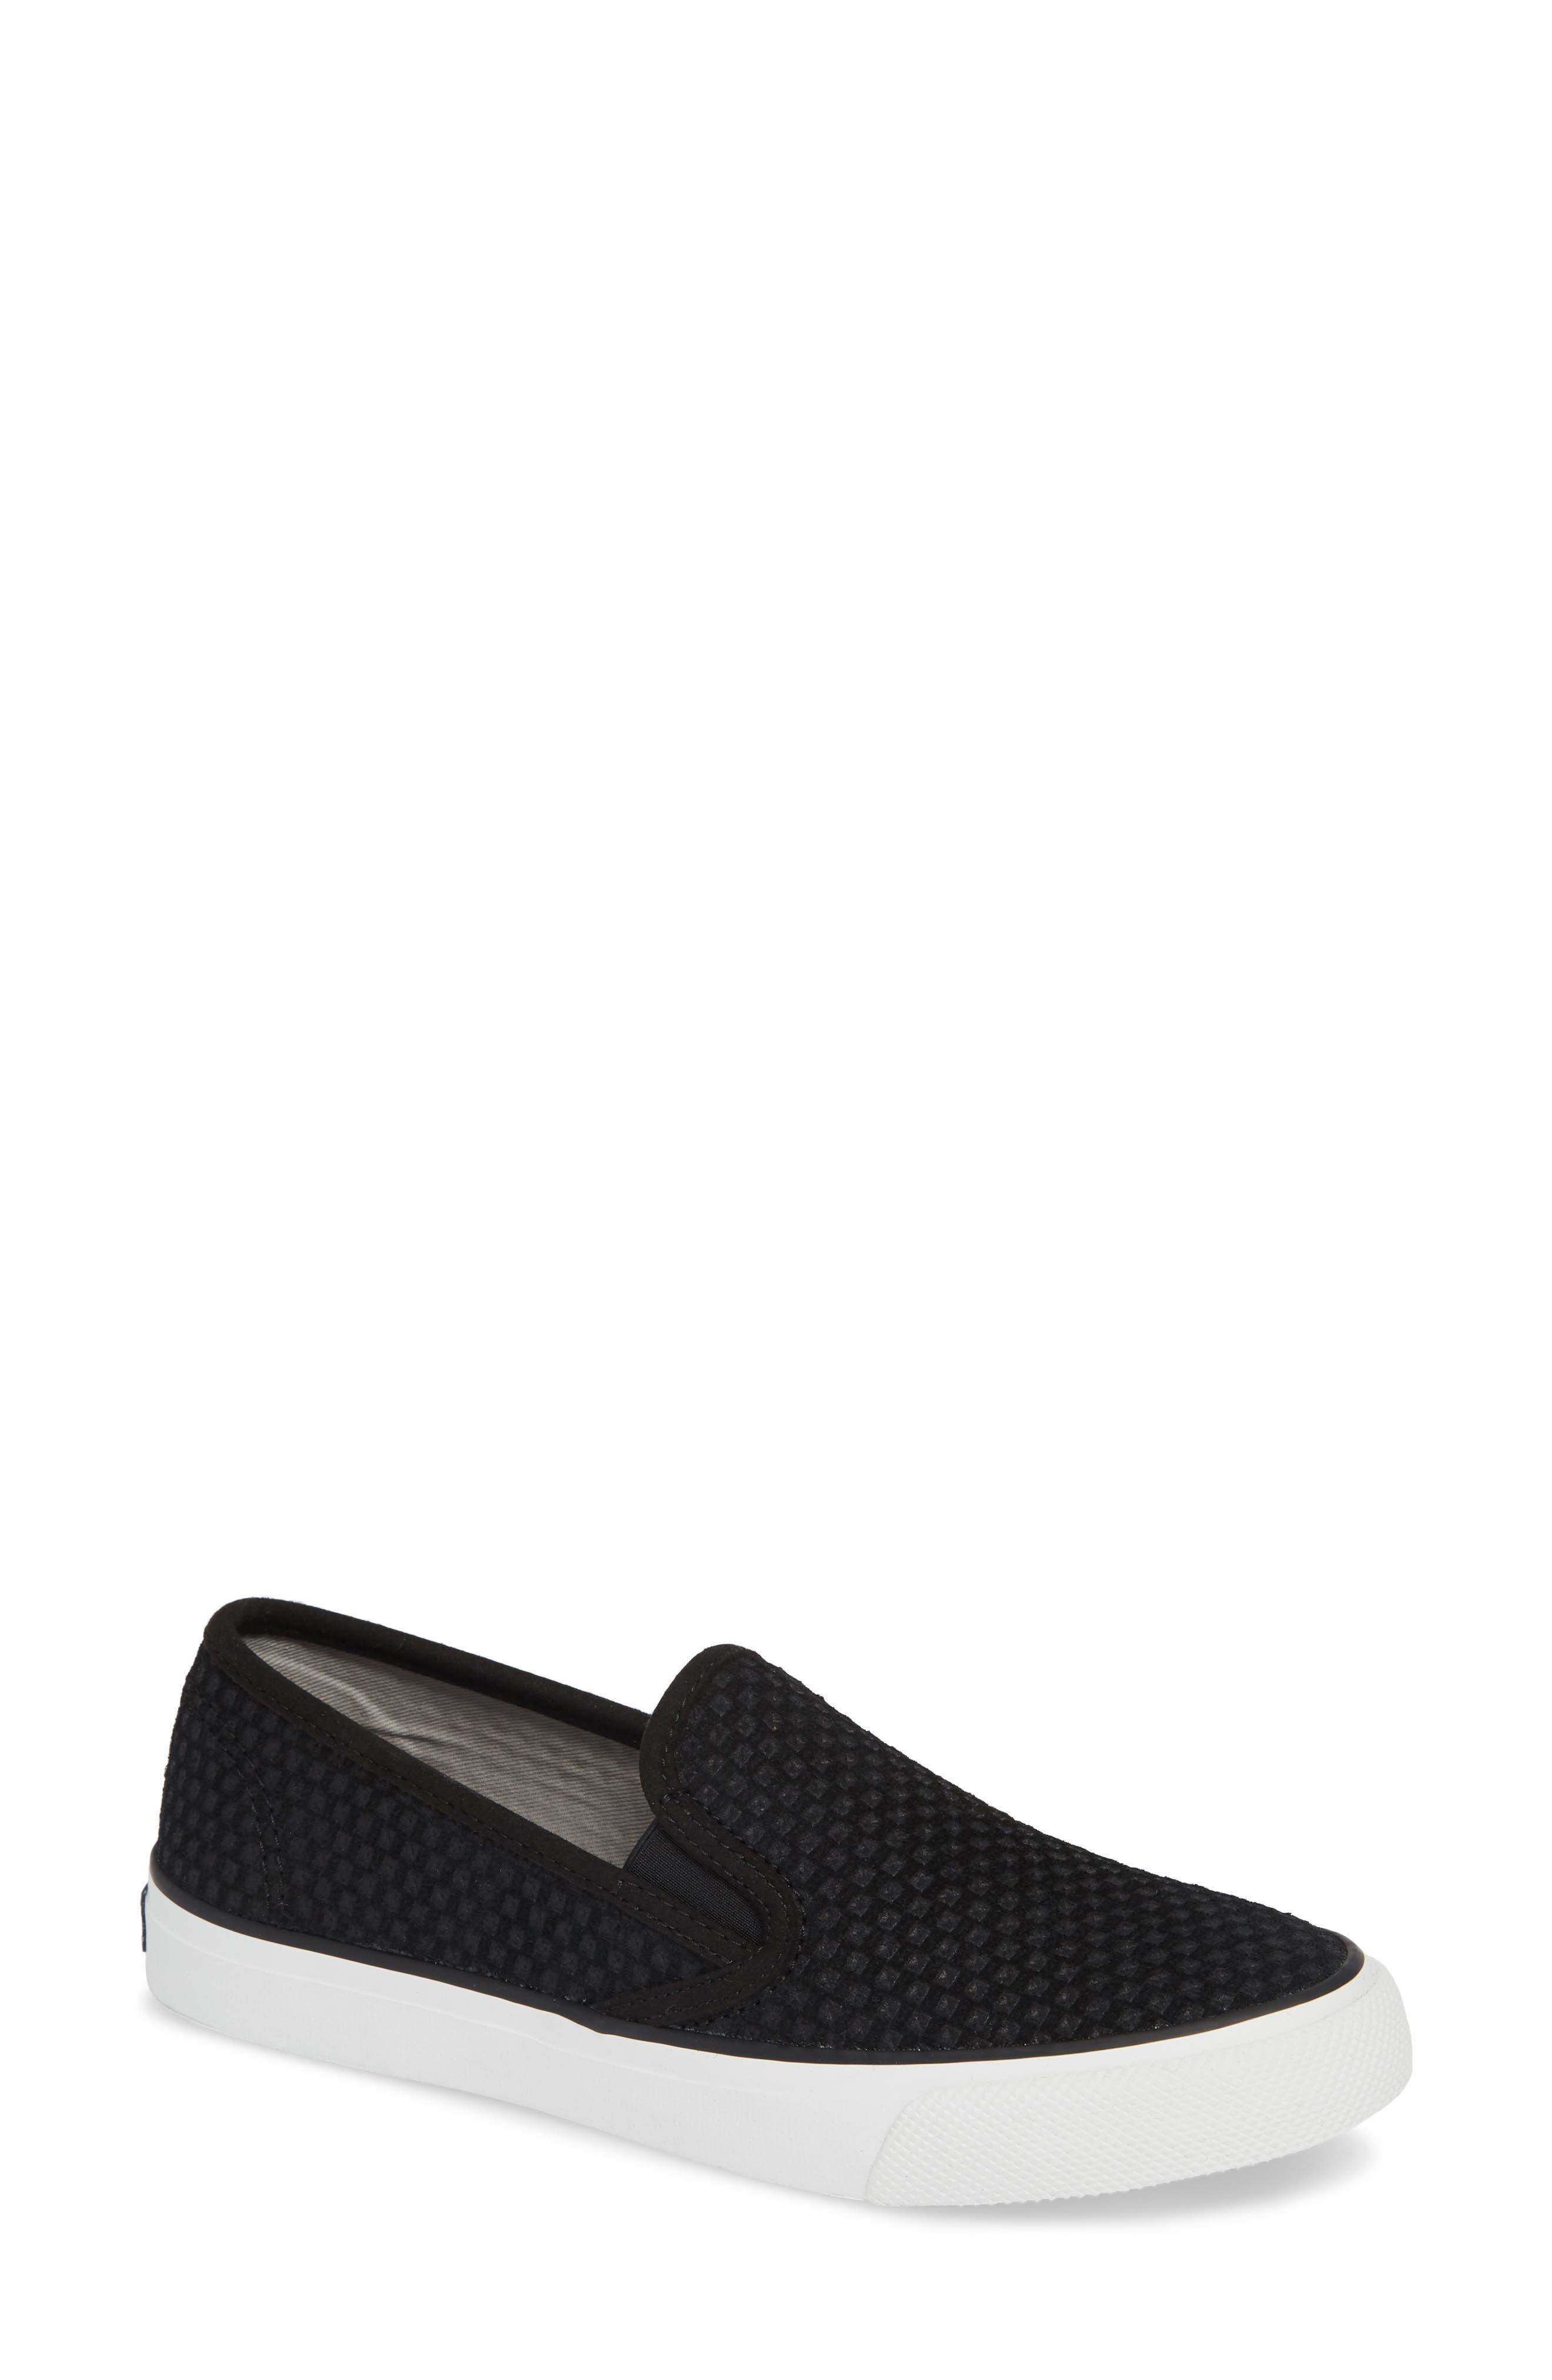 SPERRY, Seaside Embossed Slip-On Sneaker, Main thumbnail 1, color, BLACK CANVAS